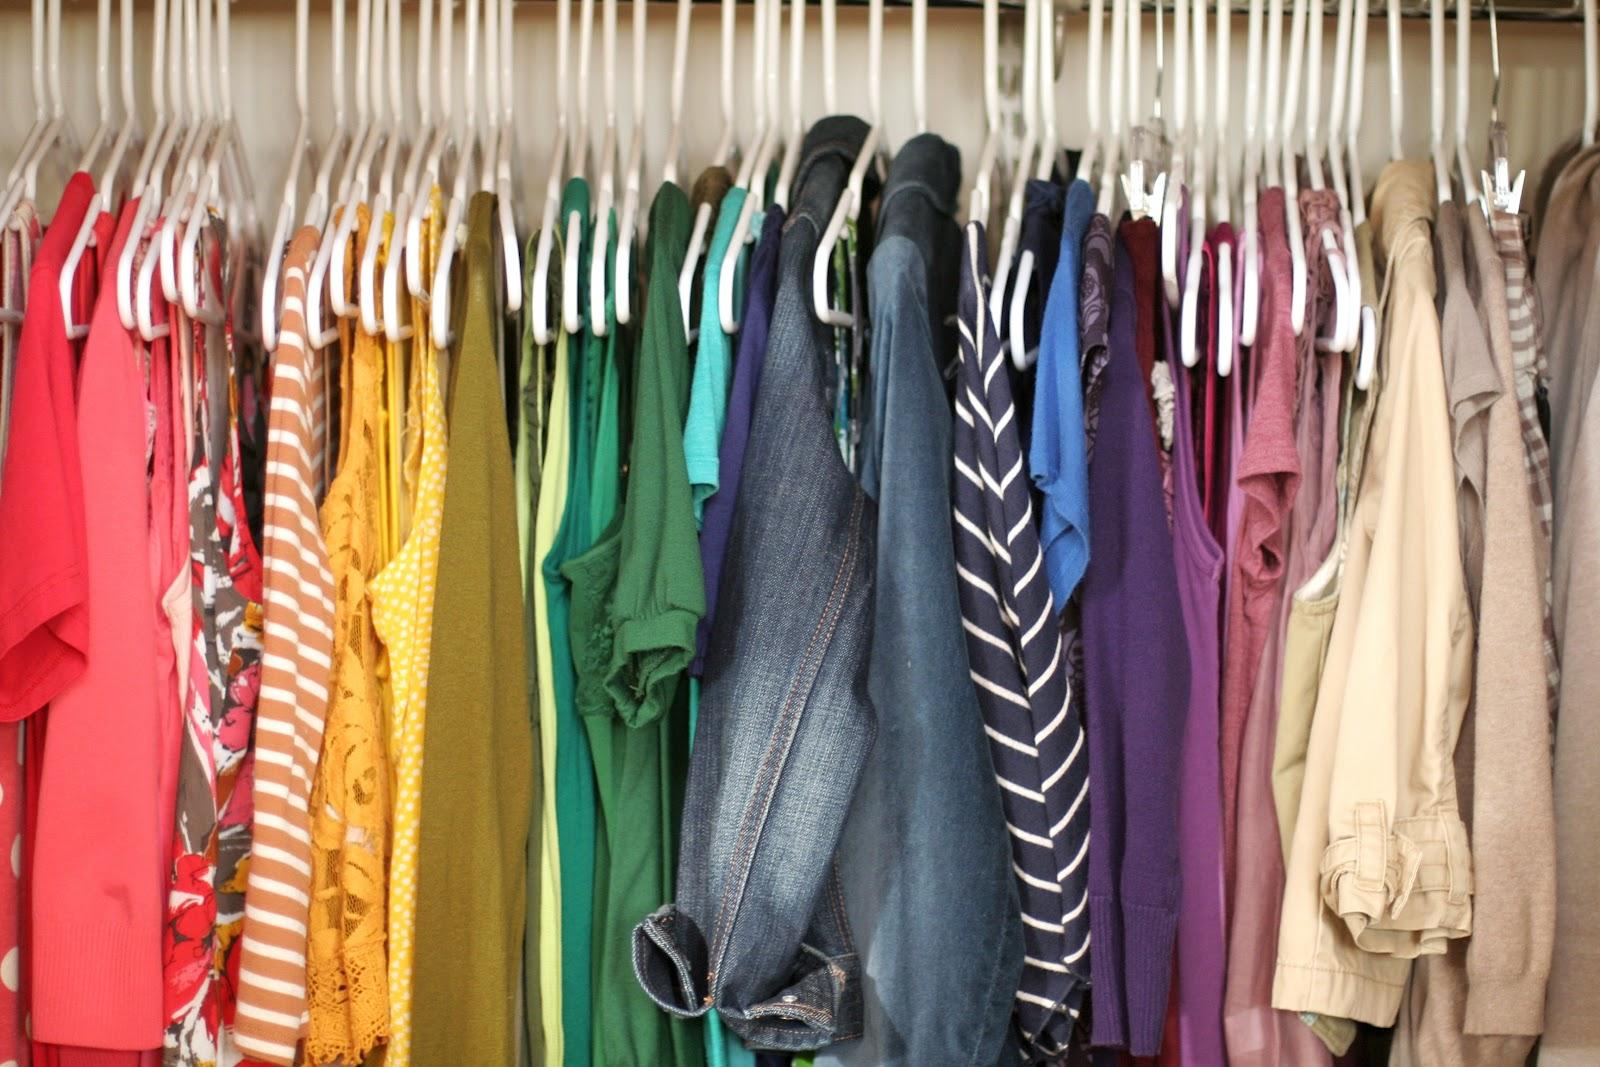 Nestled An Organized Closet